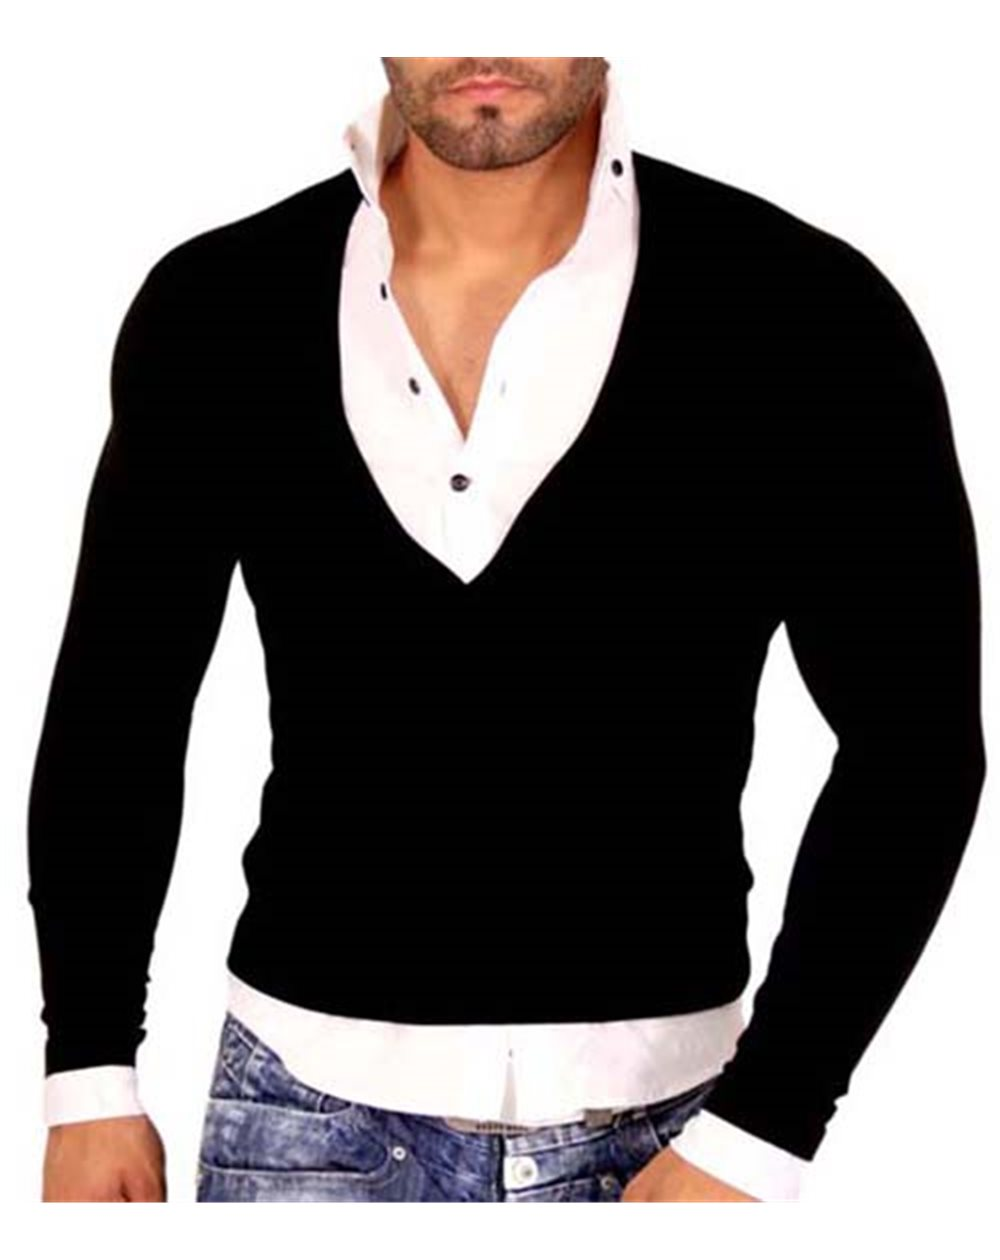 Subliminal Mode - Tee shirt chemise homme 2 en 1 manches longues col V SB724